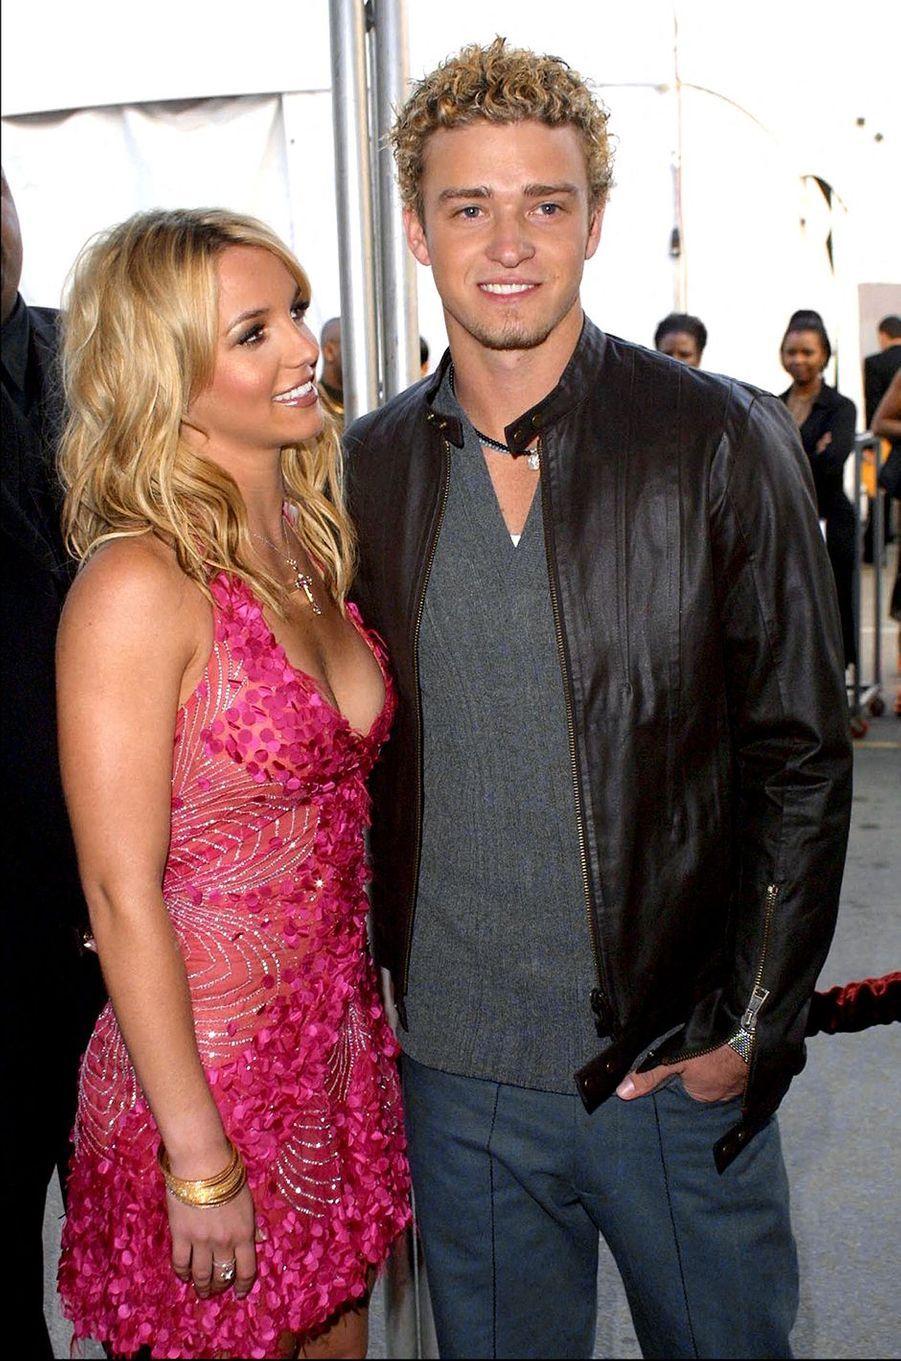 Britney Spears et Justin Timberlake à Los Angeles lors des American Music Awards en janvier 2002